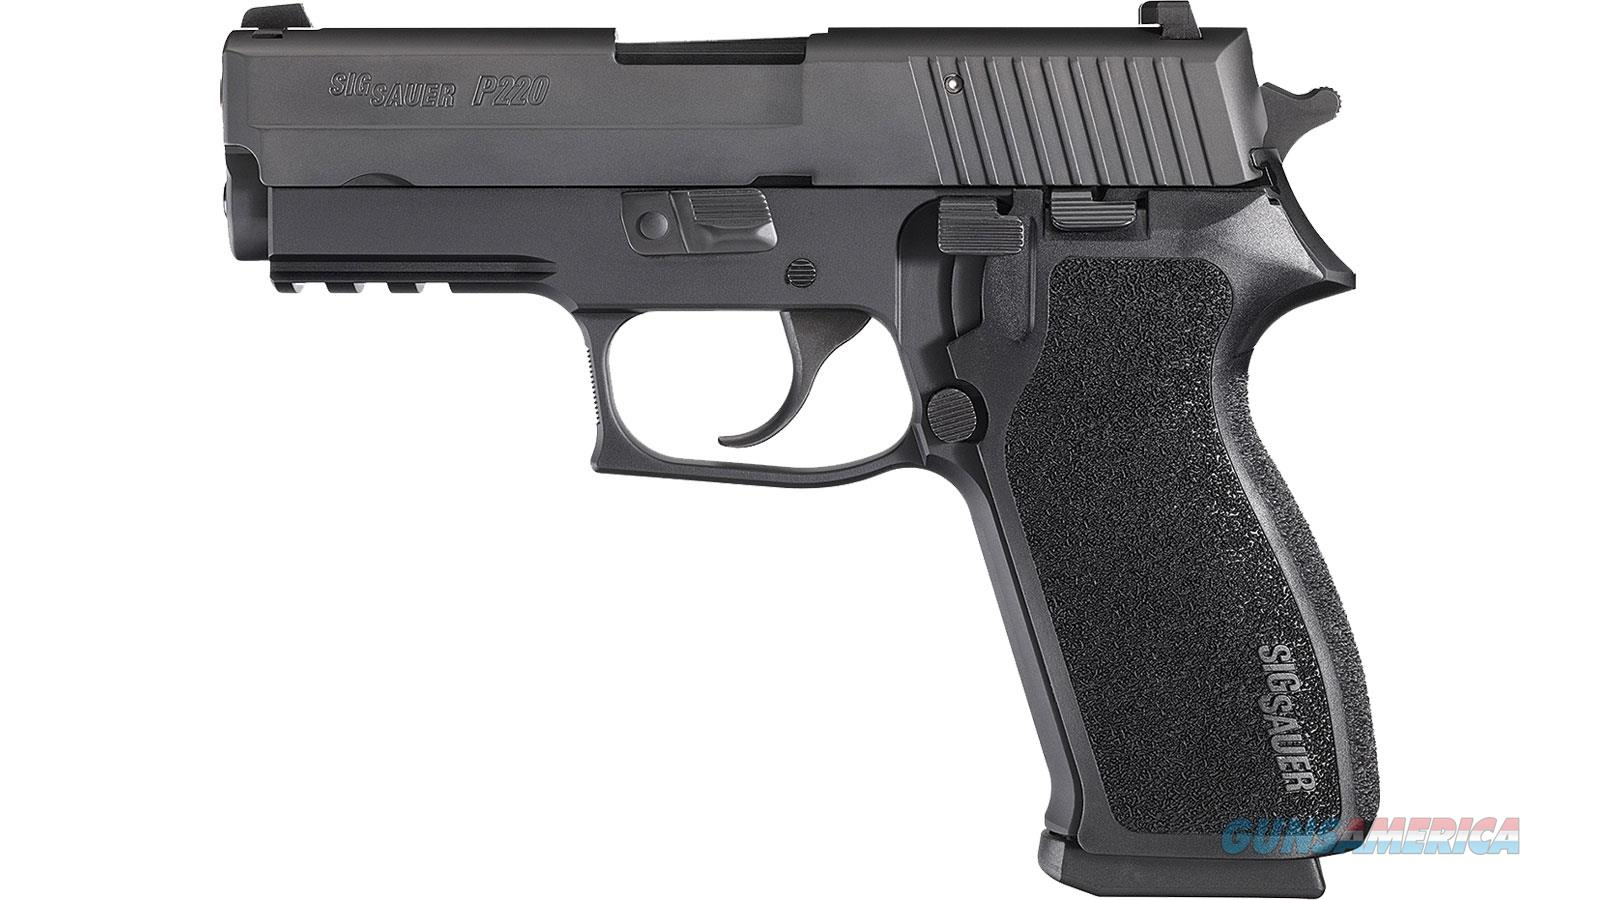 "Sig Sauer P220 45Acp 3.9"" 8Rd Sa/Da 220R3-45-BSS-CA  Guns > Pistols > S Misc Pistols"